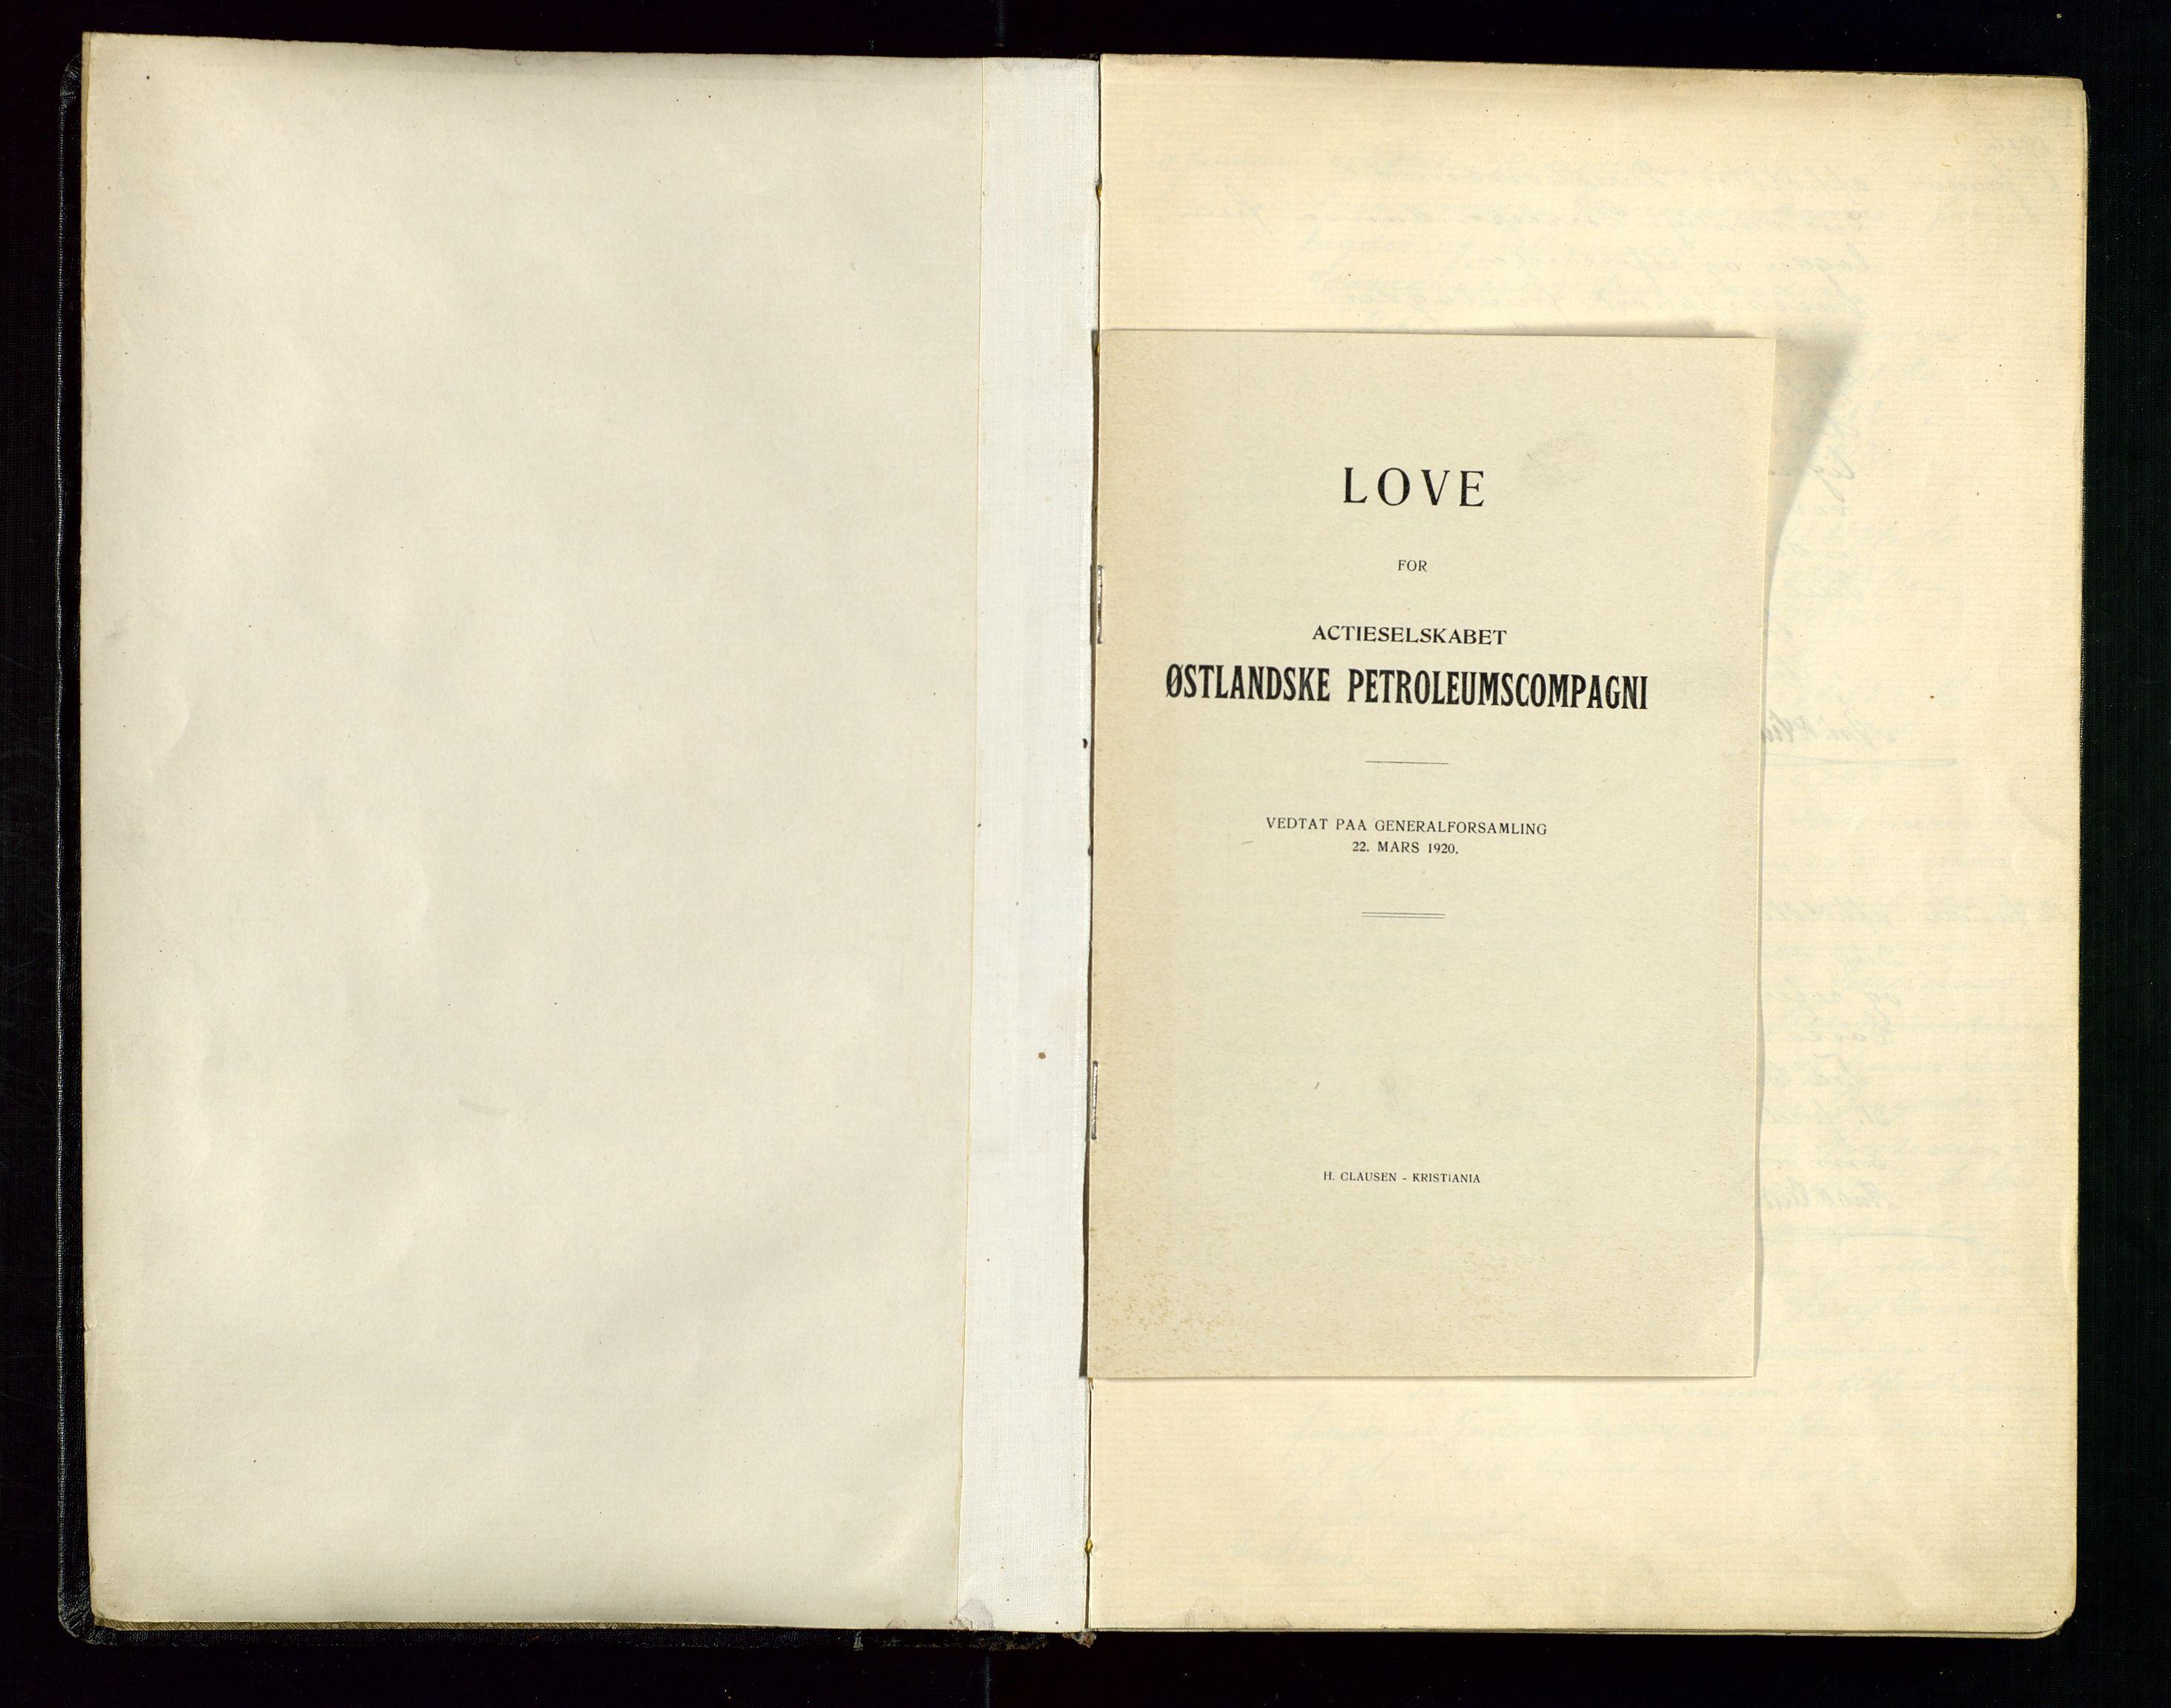 SAST, PA 1534 - Østlandske Petroleumscompagni A/S, A/Aa/L0003: Direksjonsprotokoller, 1916-1922, s. upaginert